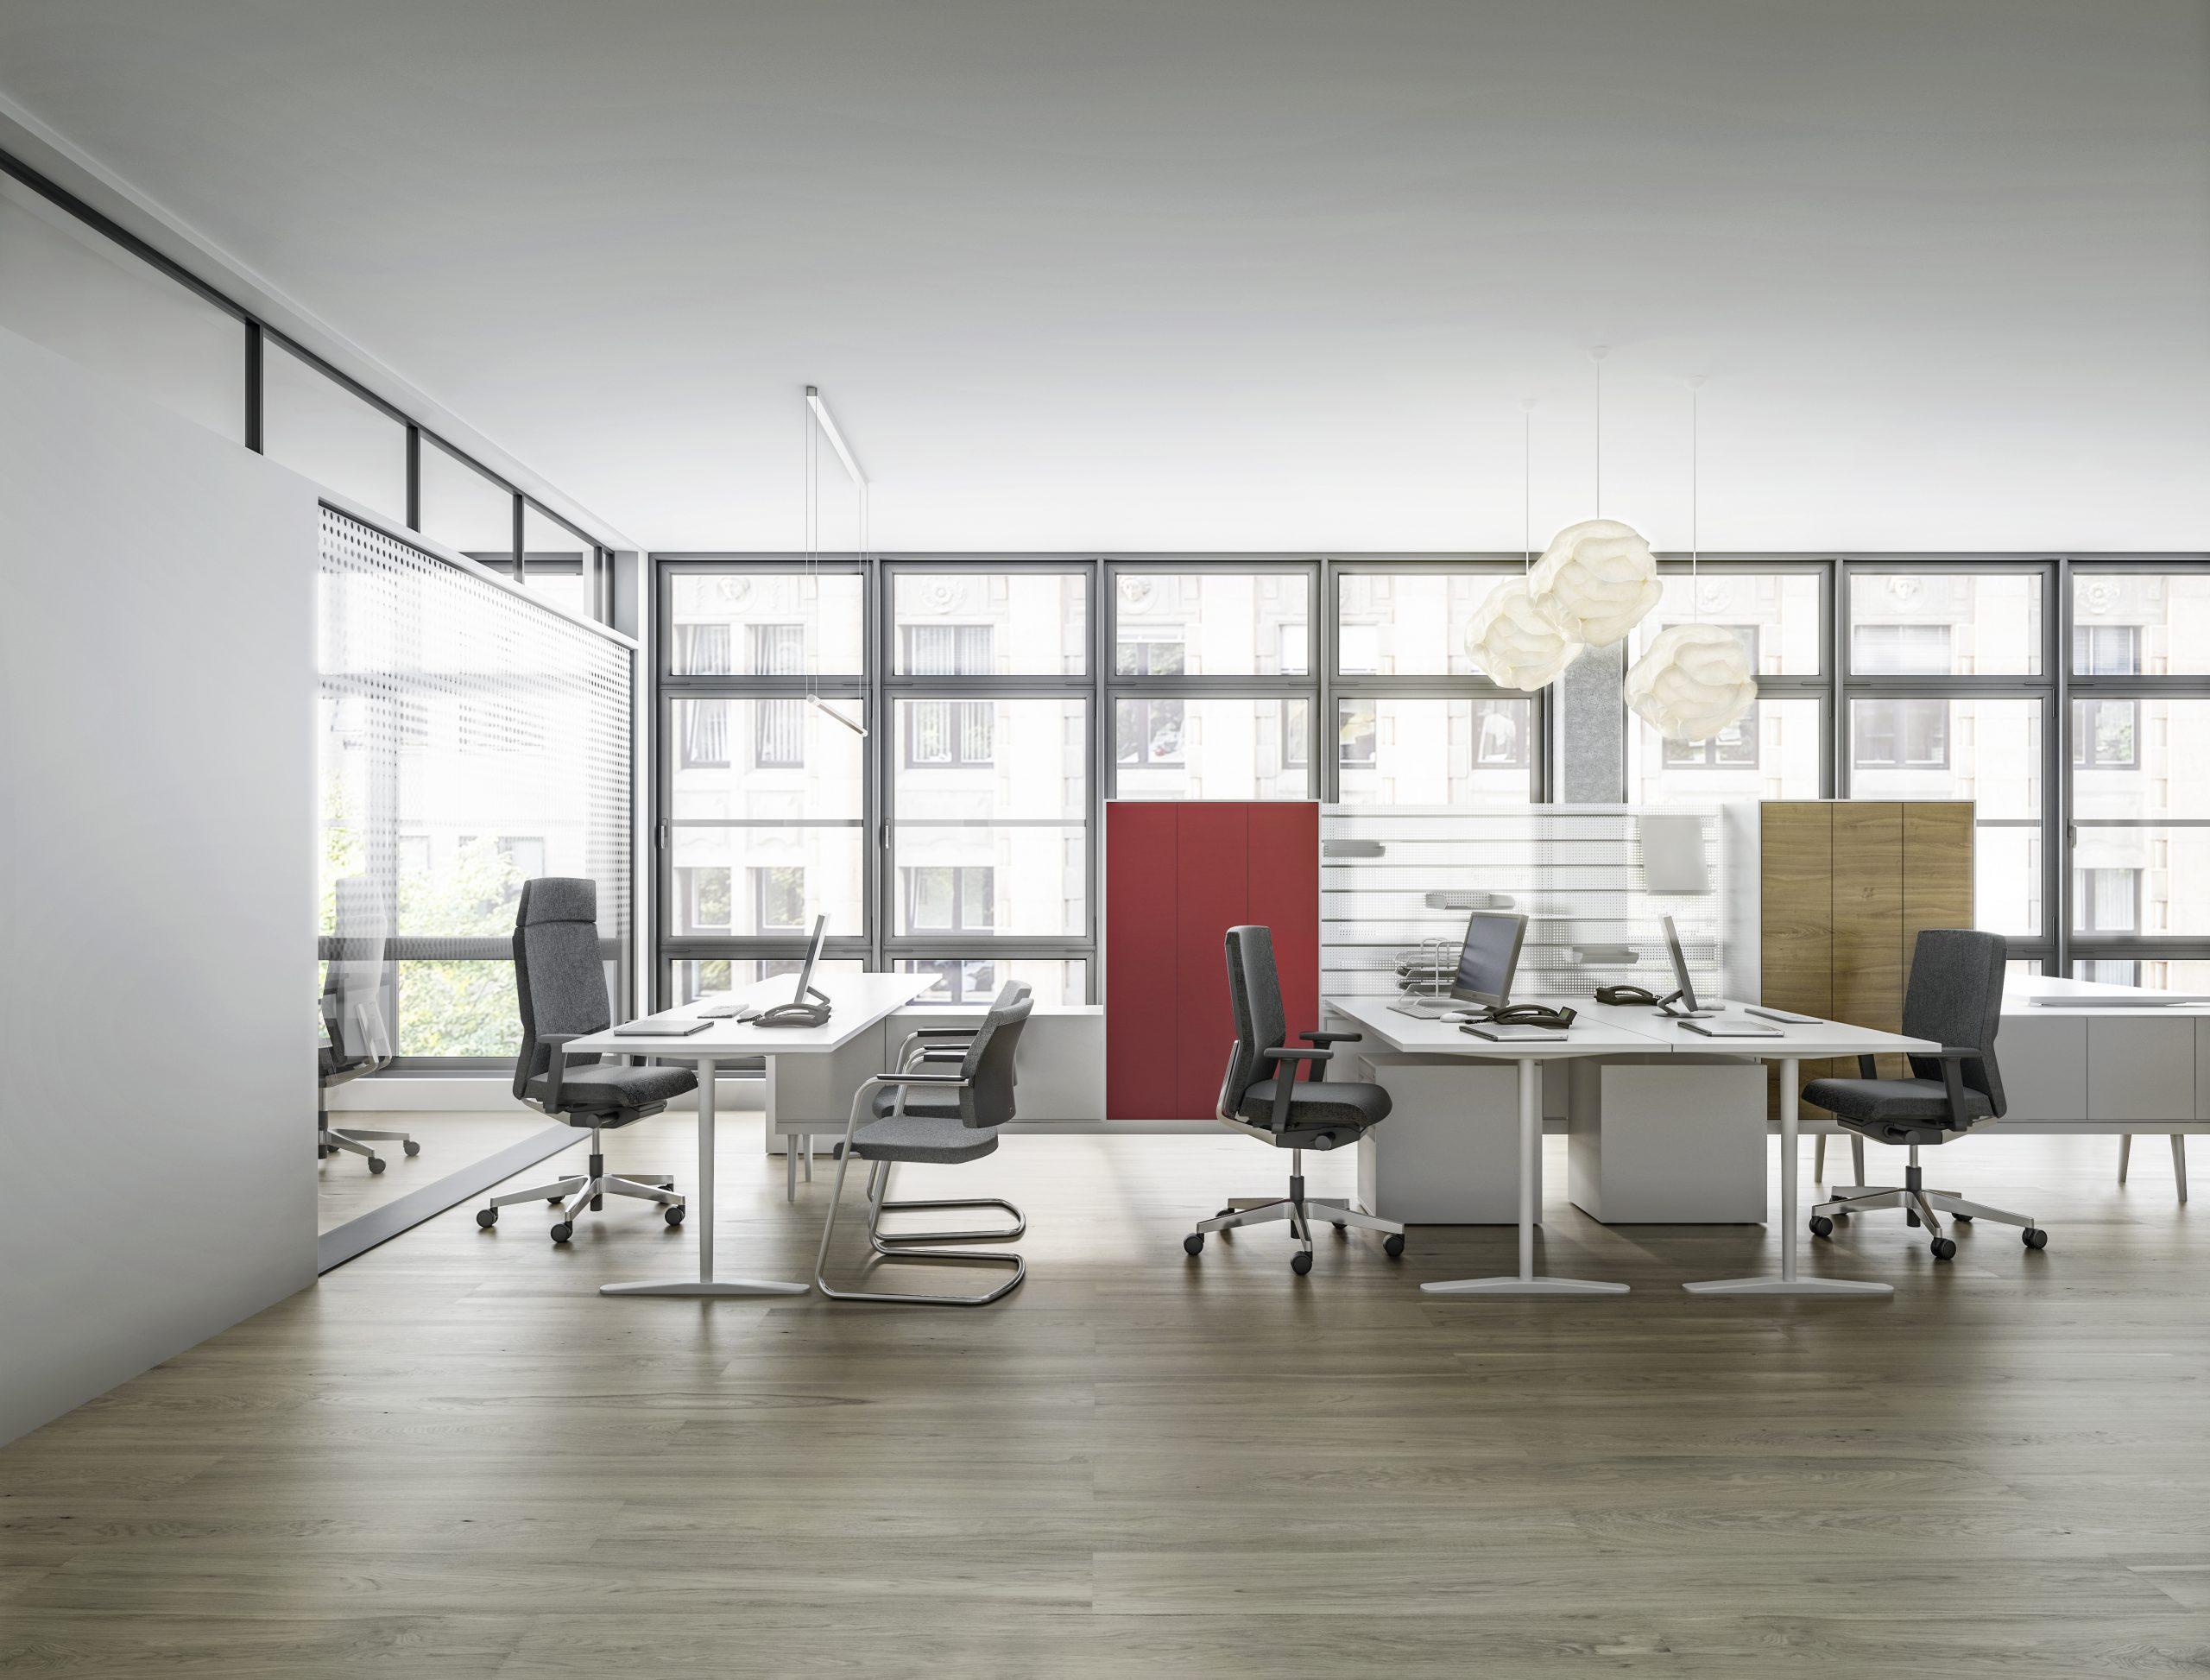 Interstuhl Yoster Arbeitsplatz Gruppenbüro Bürostühle